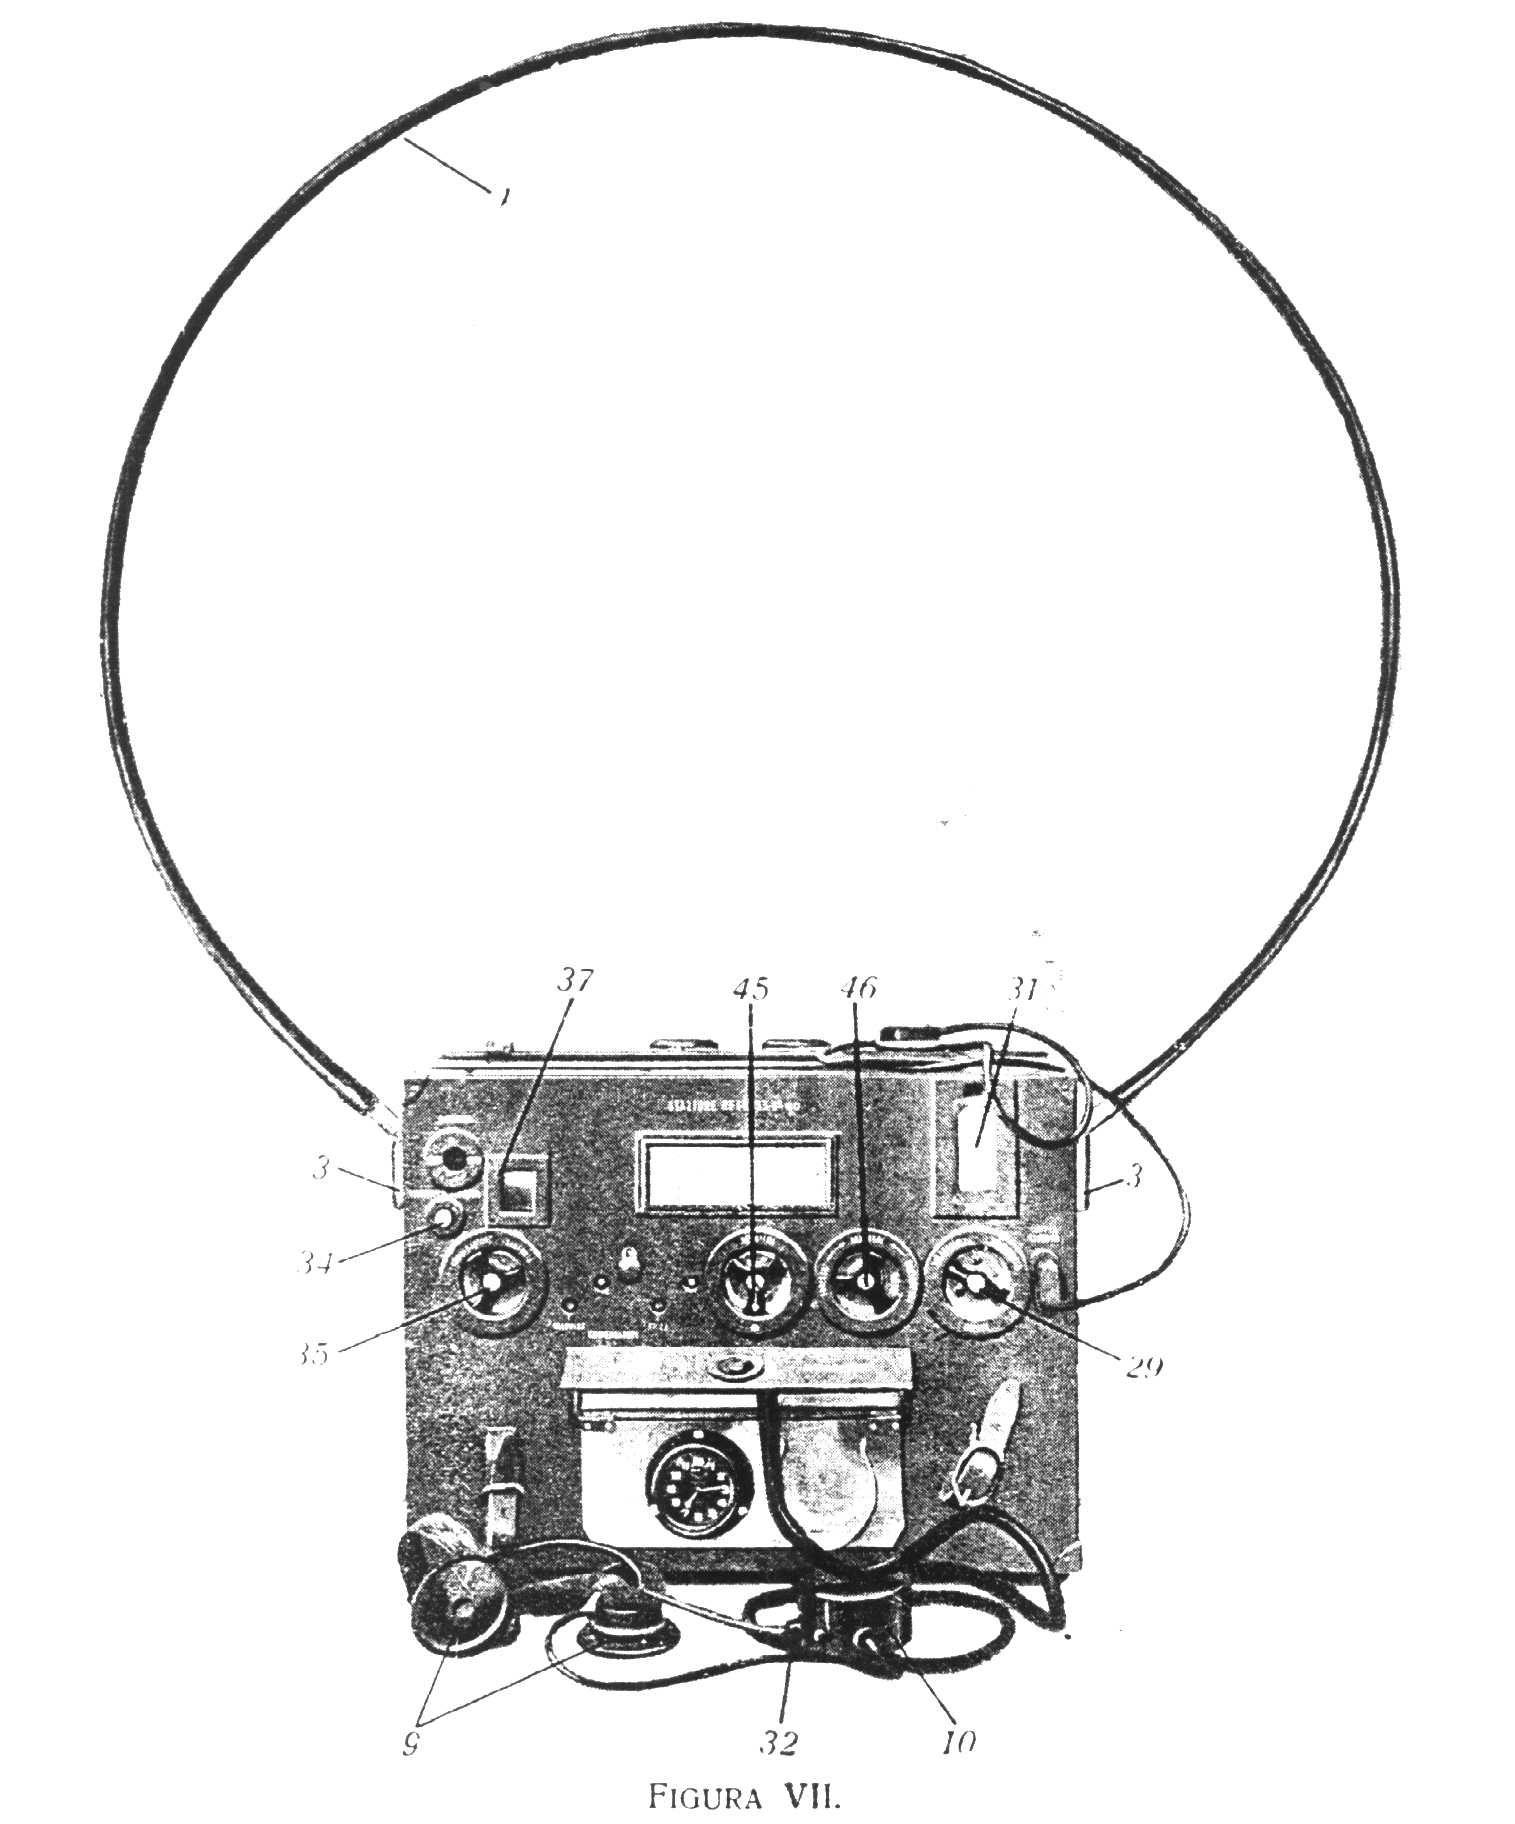 Italian Army Rf1 Manpack Radio Replaced The R1 In 1935 As The Standard Small Unit Though Manufactured Supply Didn T Meet Deman Green Radio Italian Army Radio